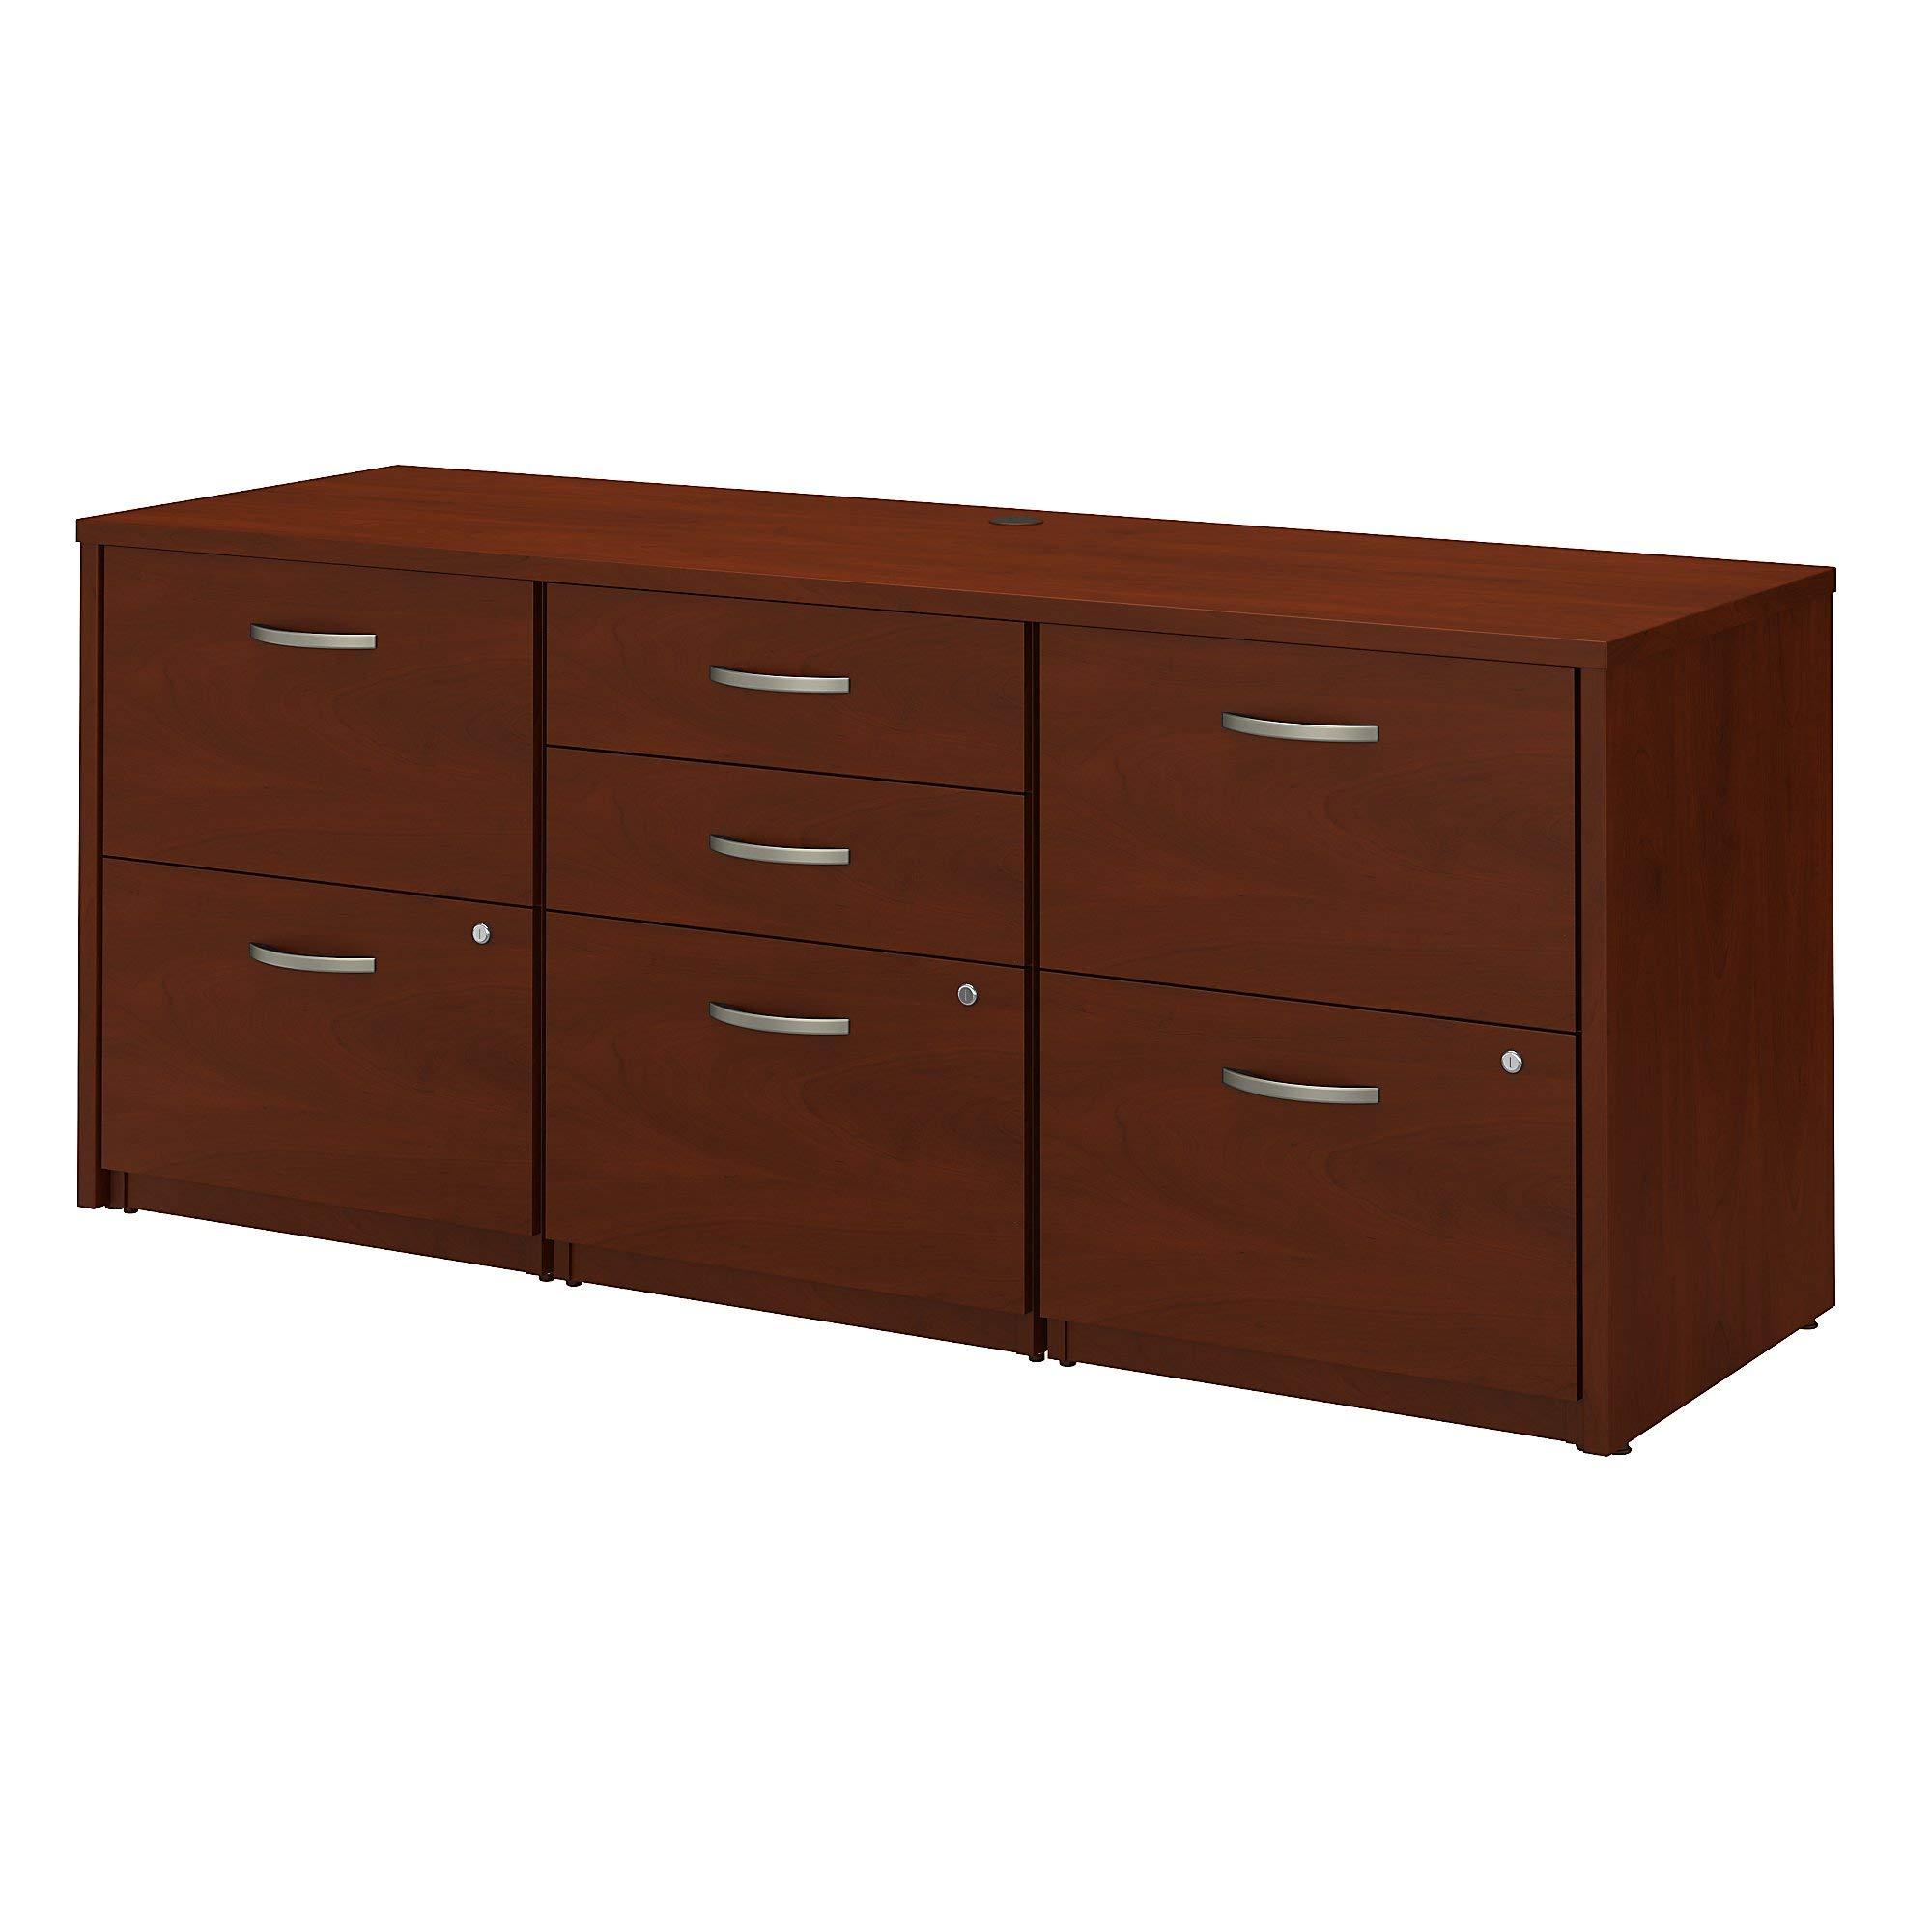 Bush Business Furniture Series C Elite Storage Credenza, Hansen Cherry by Bush Business Furniture (Image #1)